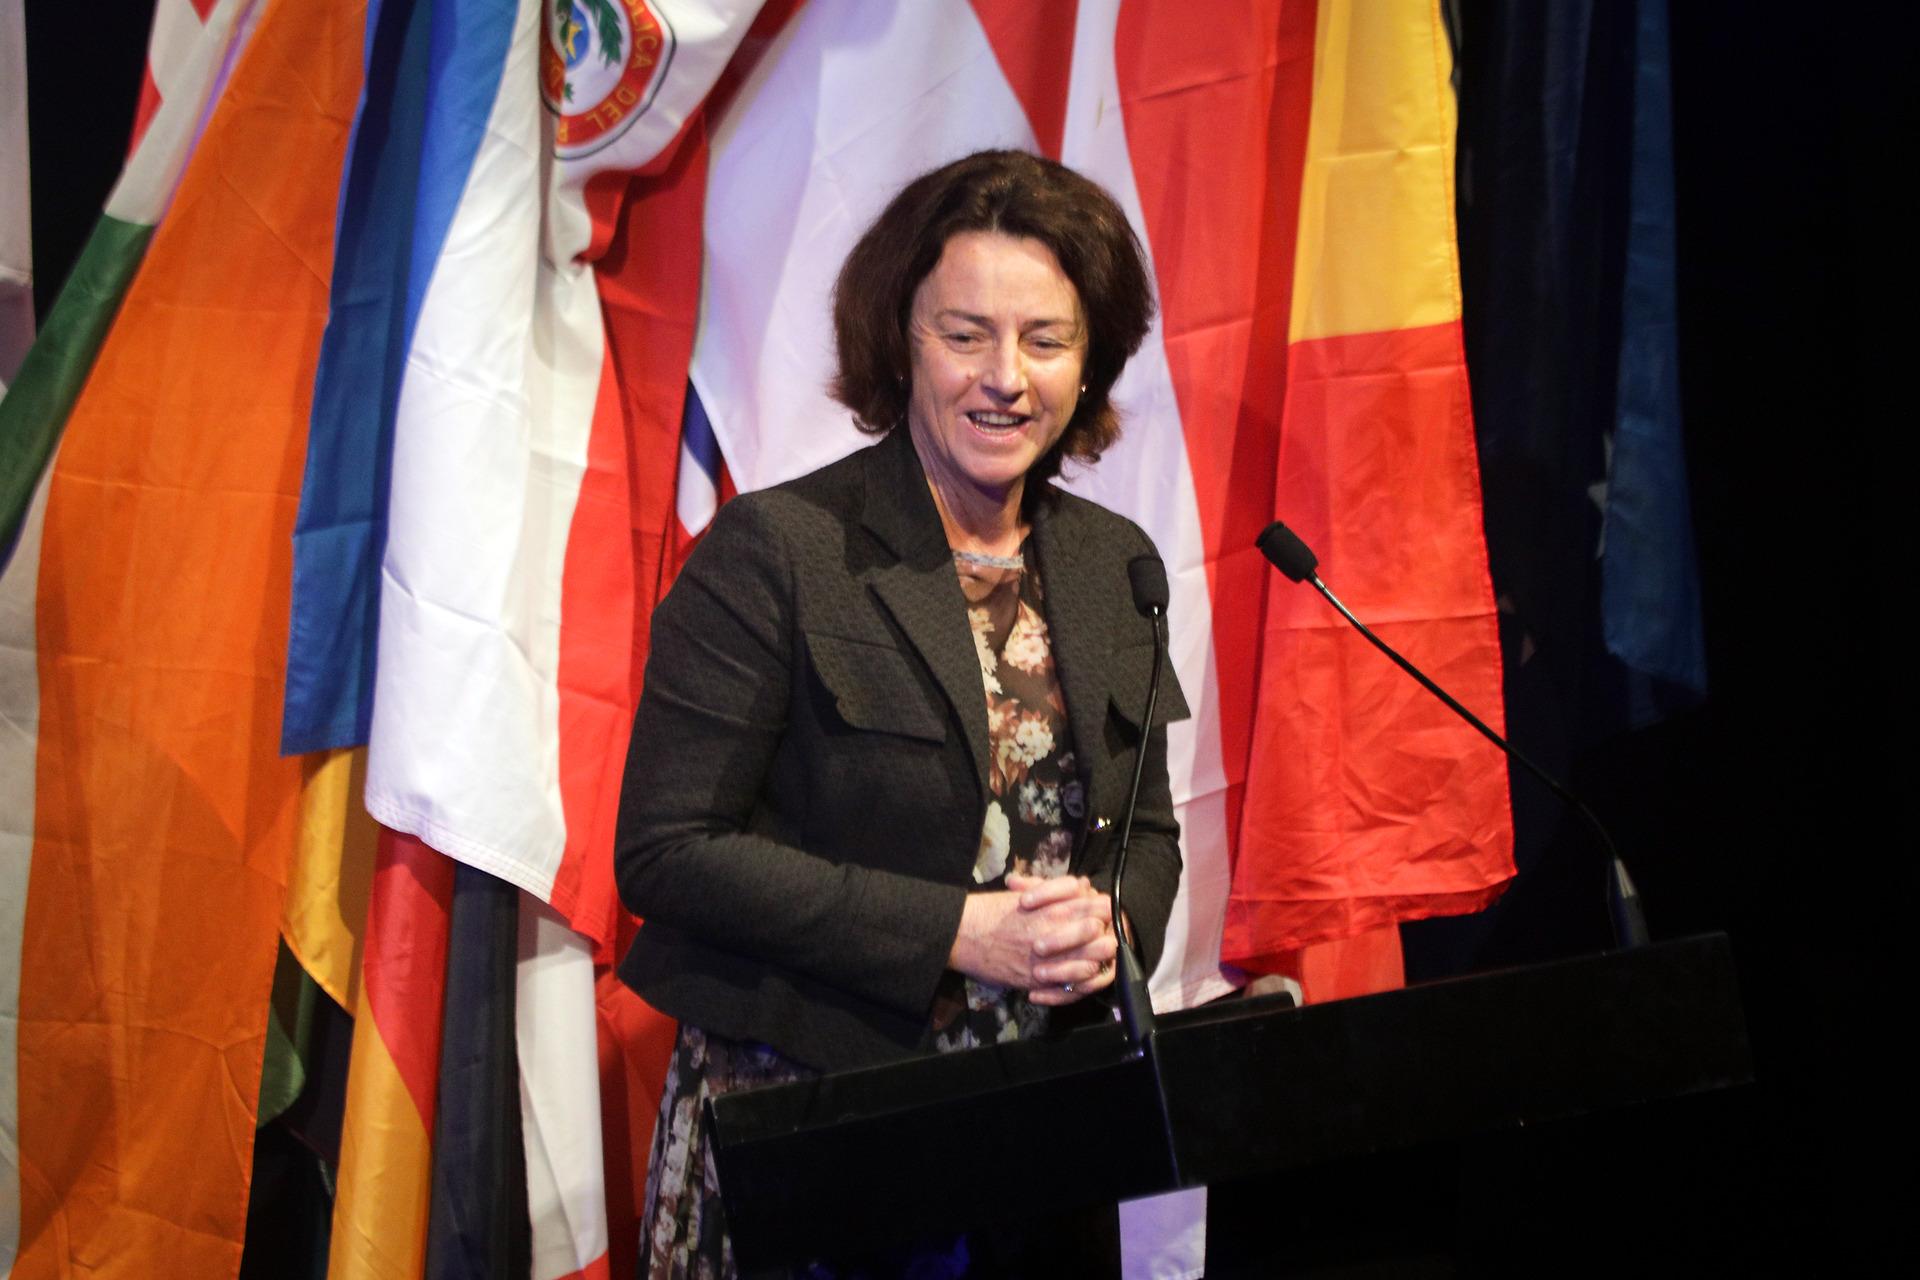 Dame Susan Devoy withdraws from Tauranga mayoralty race